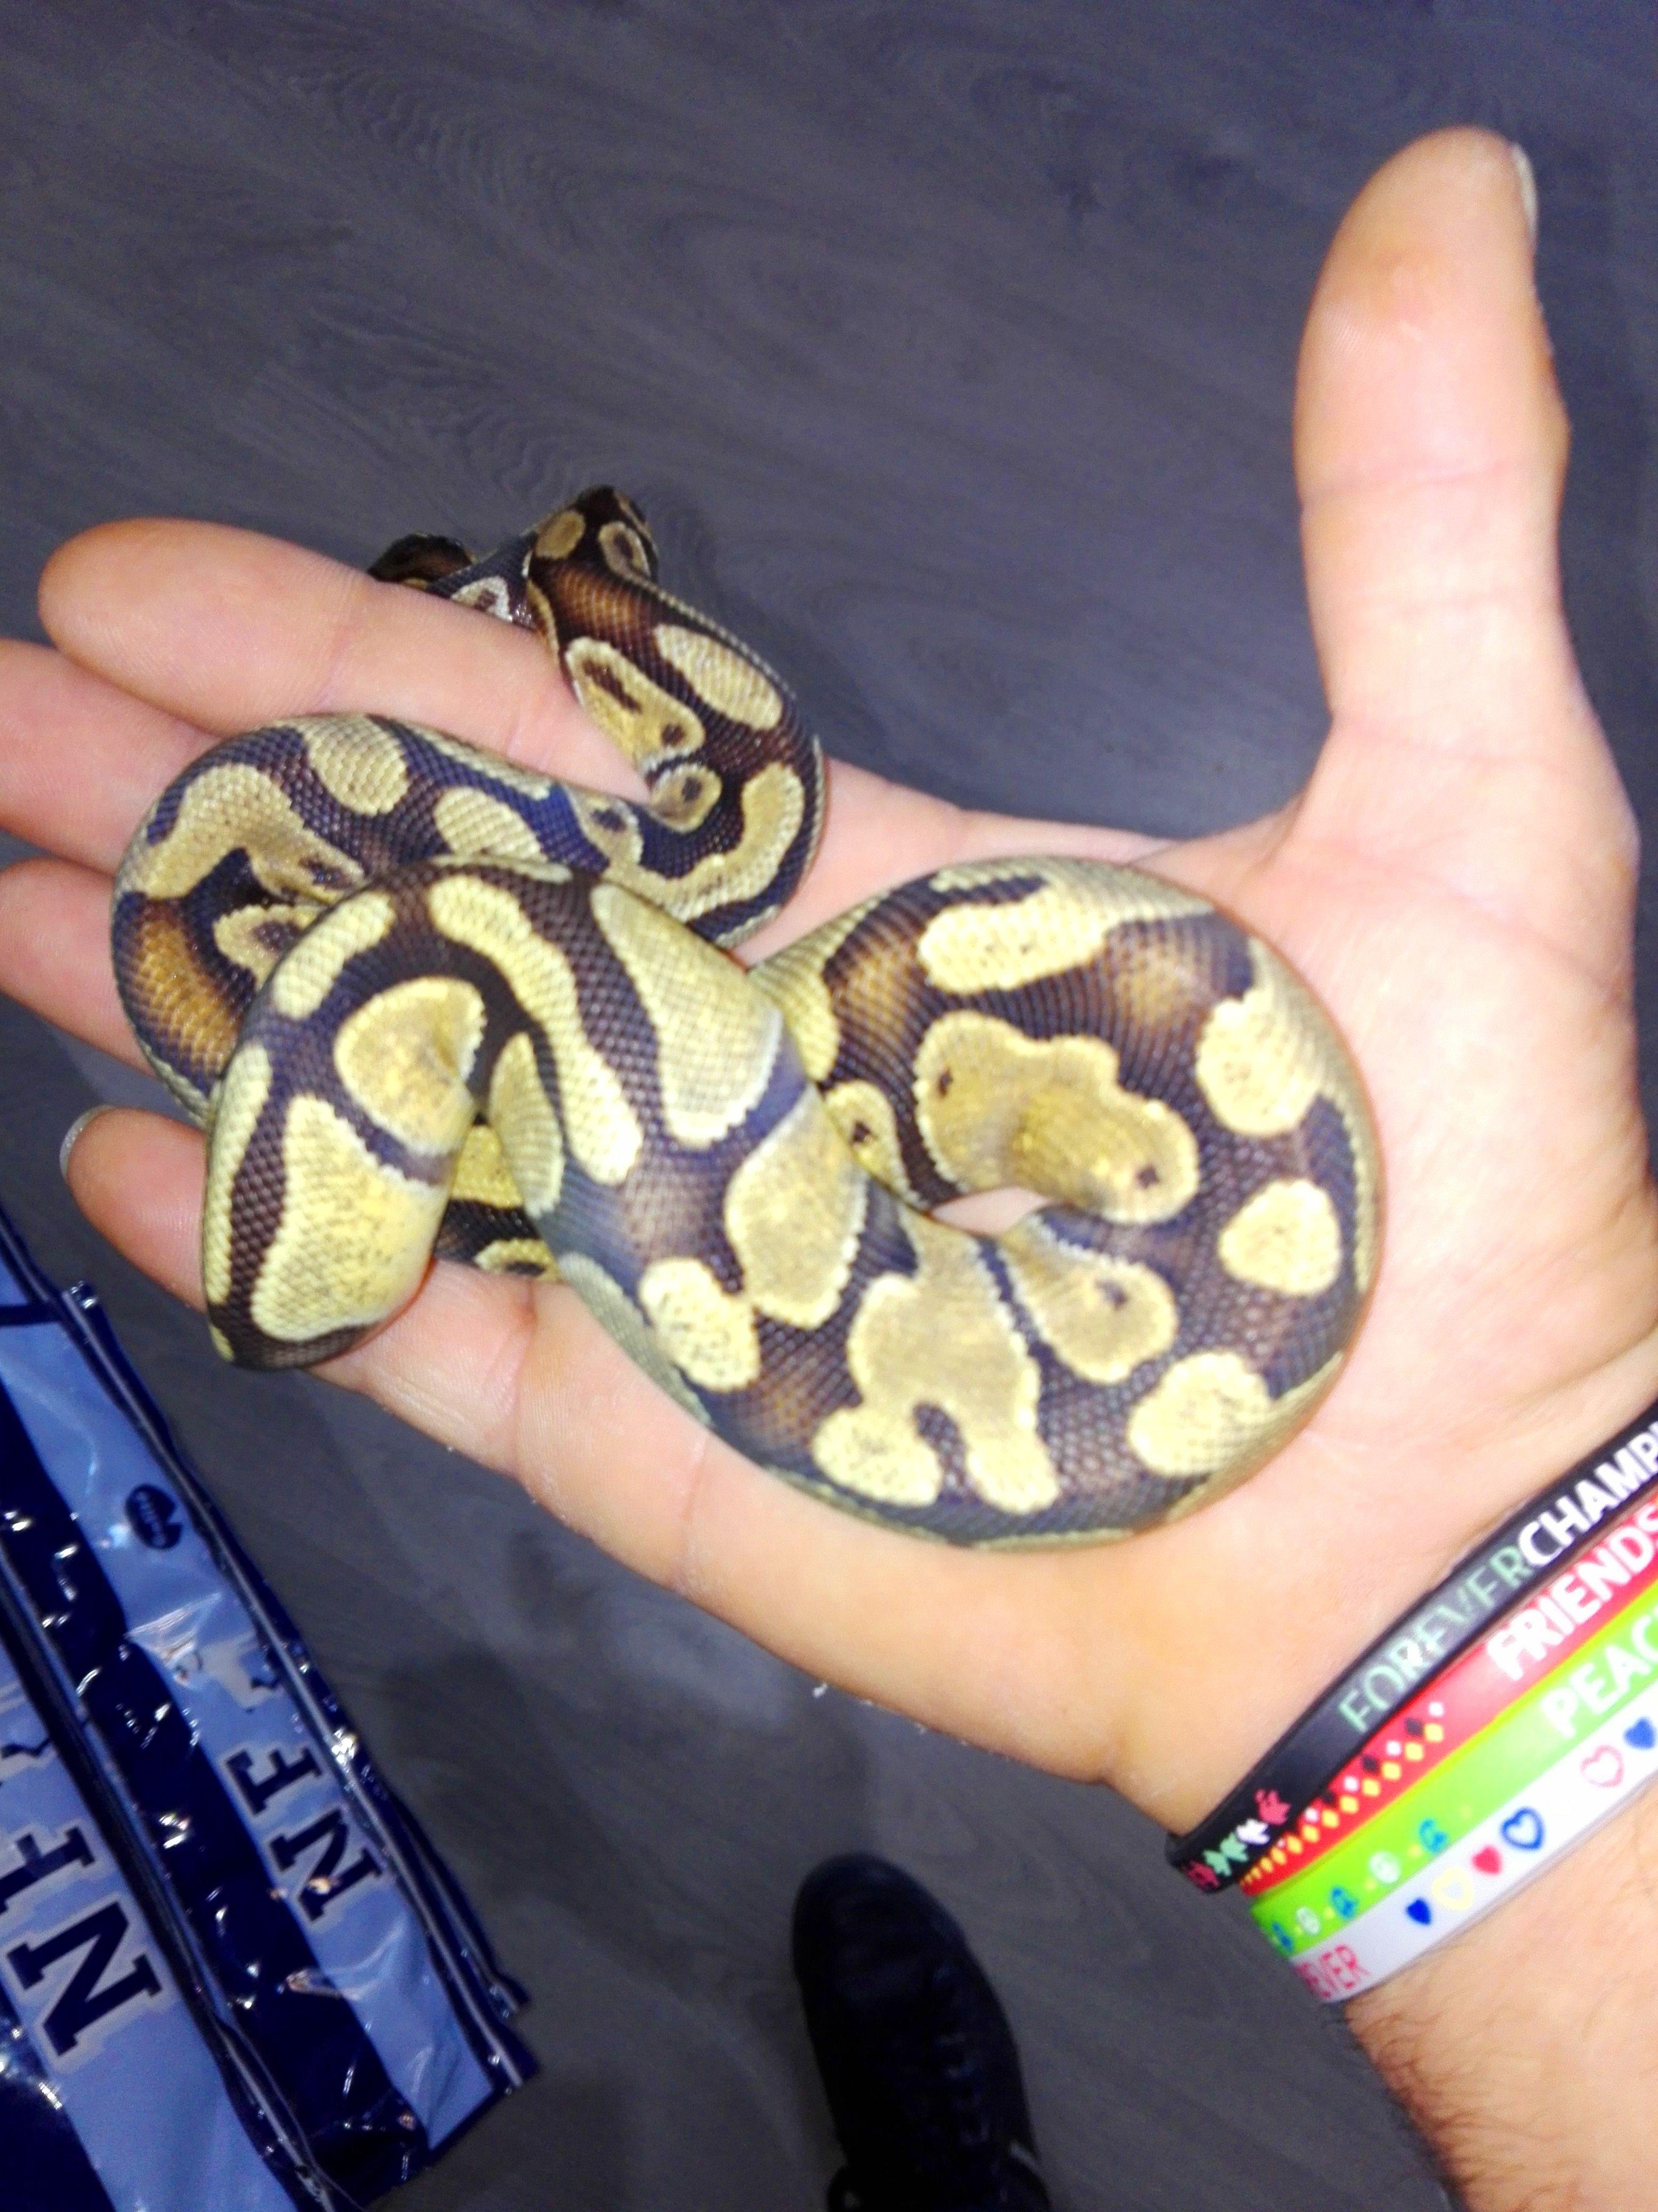 Python regius engi